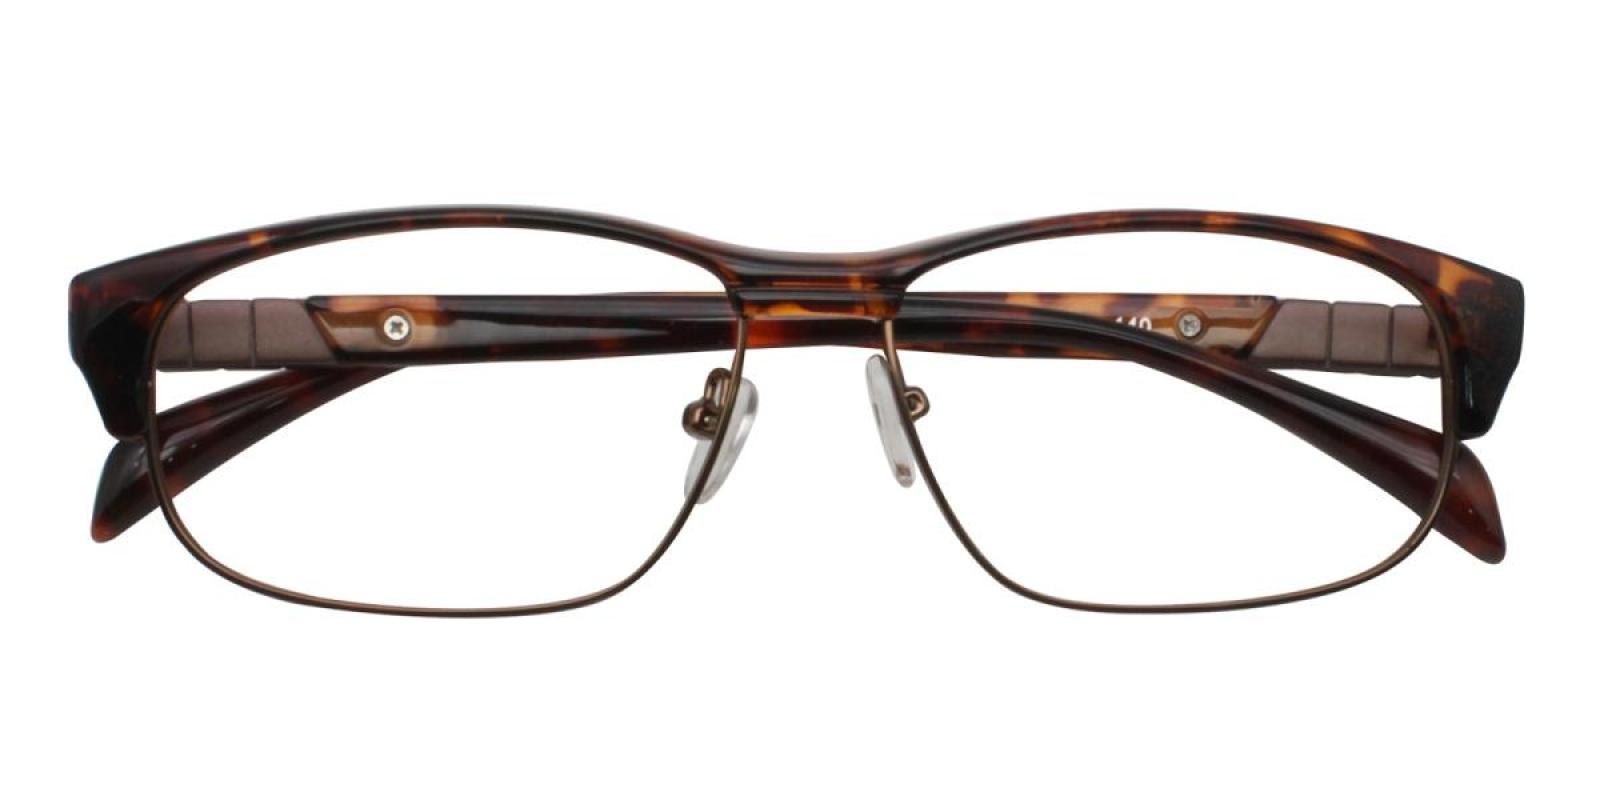 Colin-Leopard-Rectangle-Combination / Metal / TR-Eyeglasses-detail